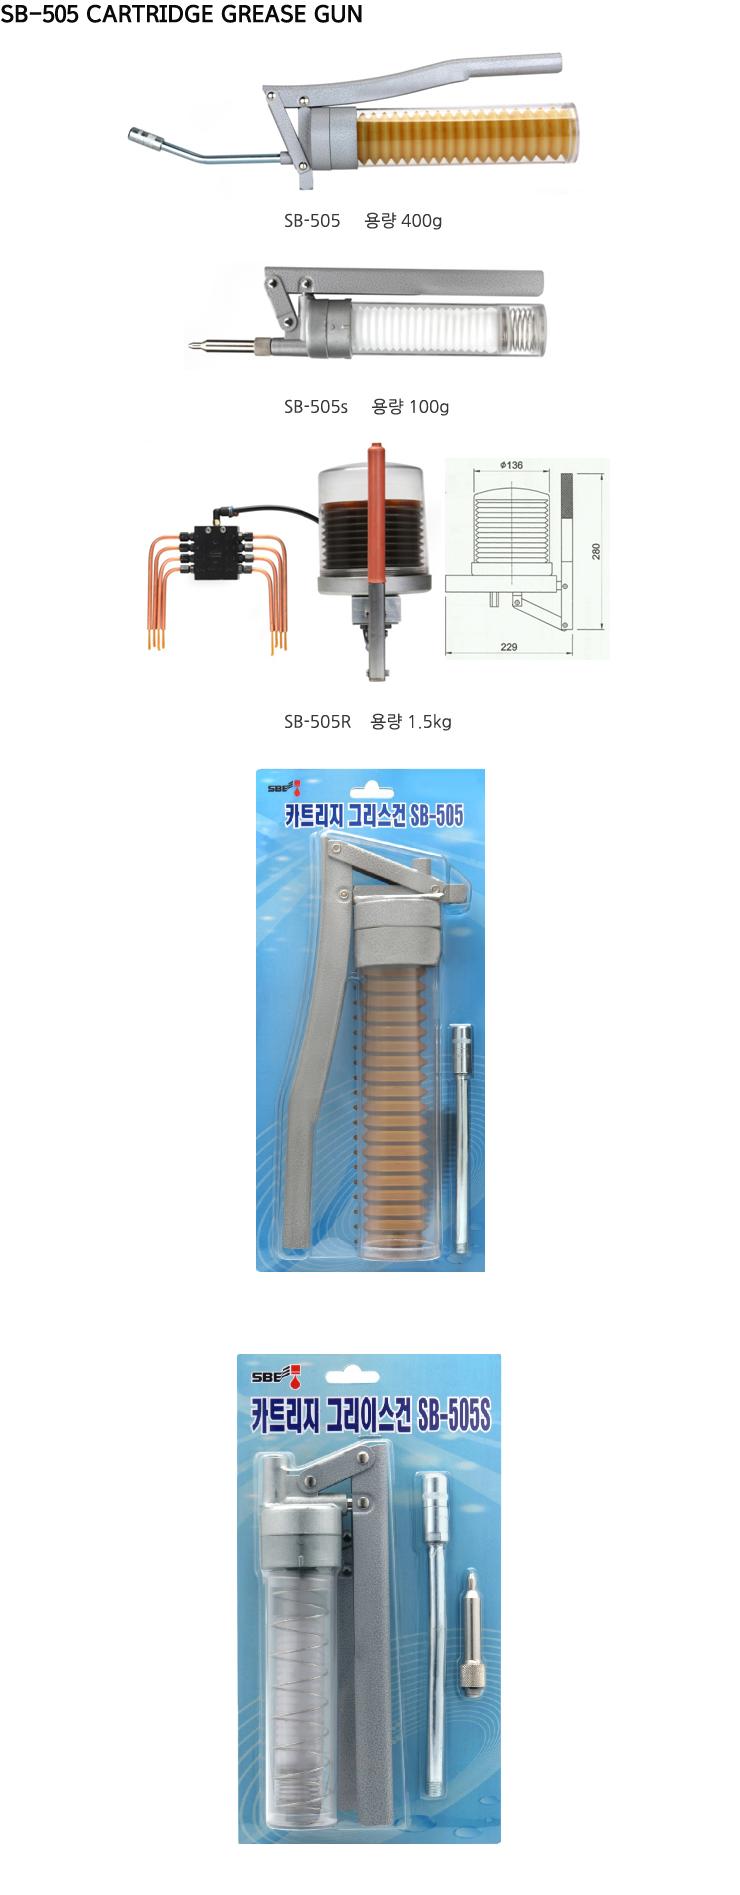 SEONG BO ENTERPRISE Cartridge Grease Gun SB-505